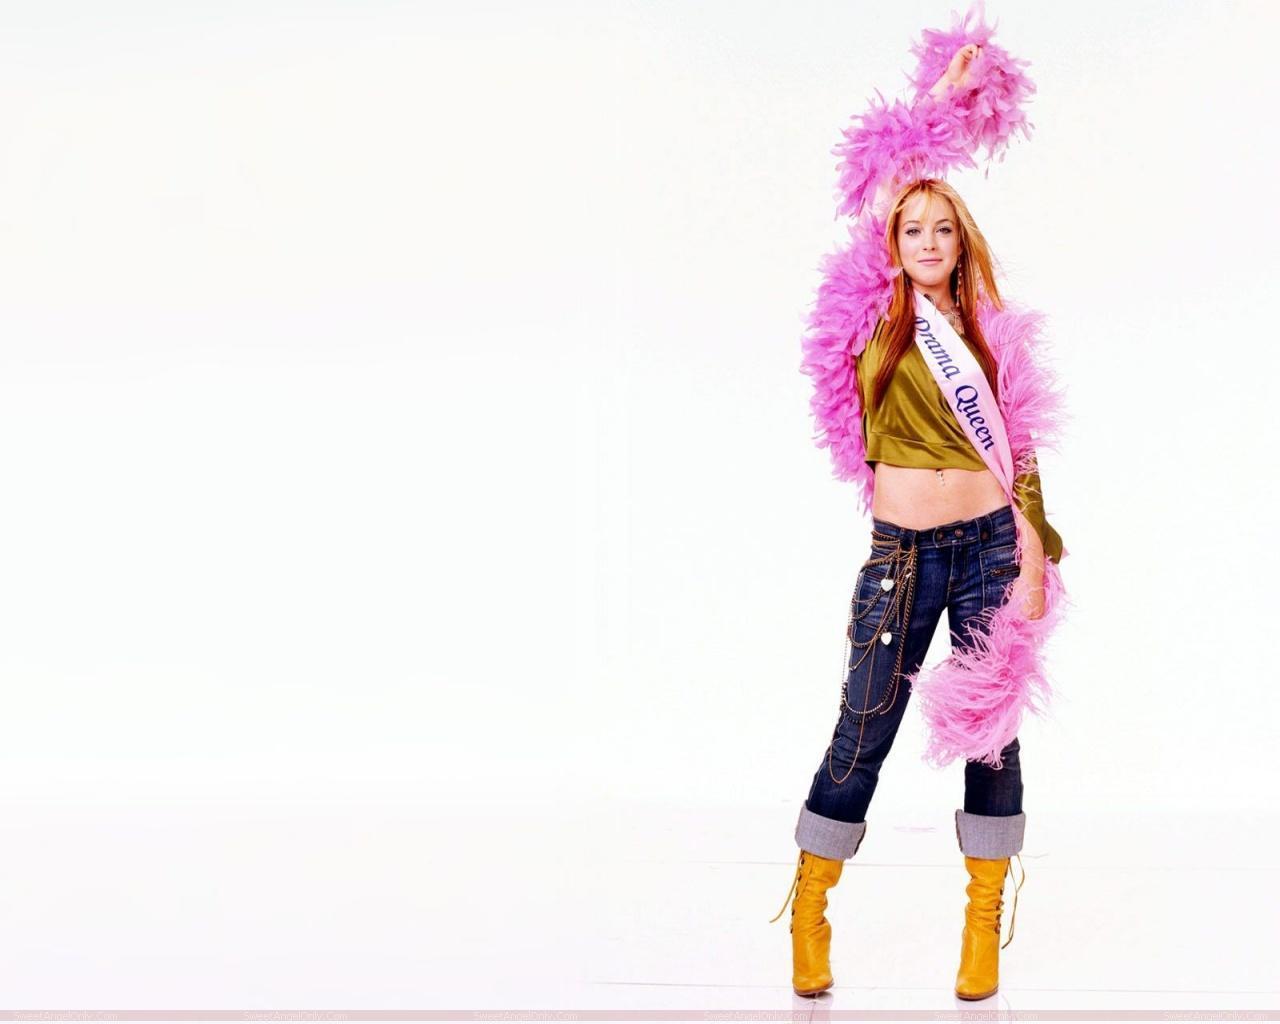 http://3.bp.blogspot.com/-oJcvC3bU0n0/TYcCiaNkUkI/AAAAAAAAFwM/Xs-OiVHrNu4/s1600/lindsay_lohan_hollywood_hot_actress_wallpaper_sweetangelonly_31.jpg